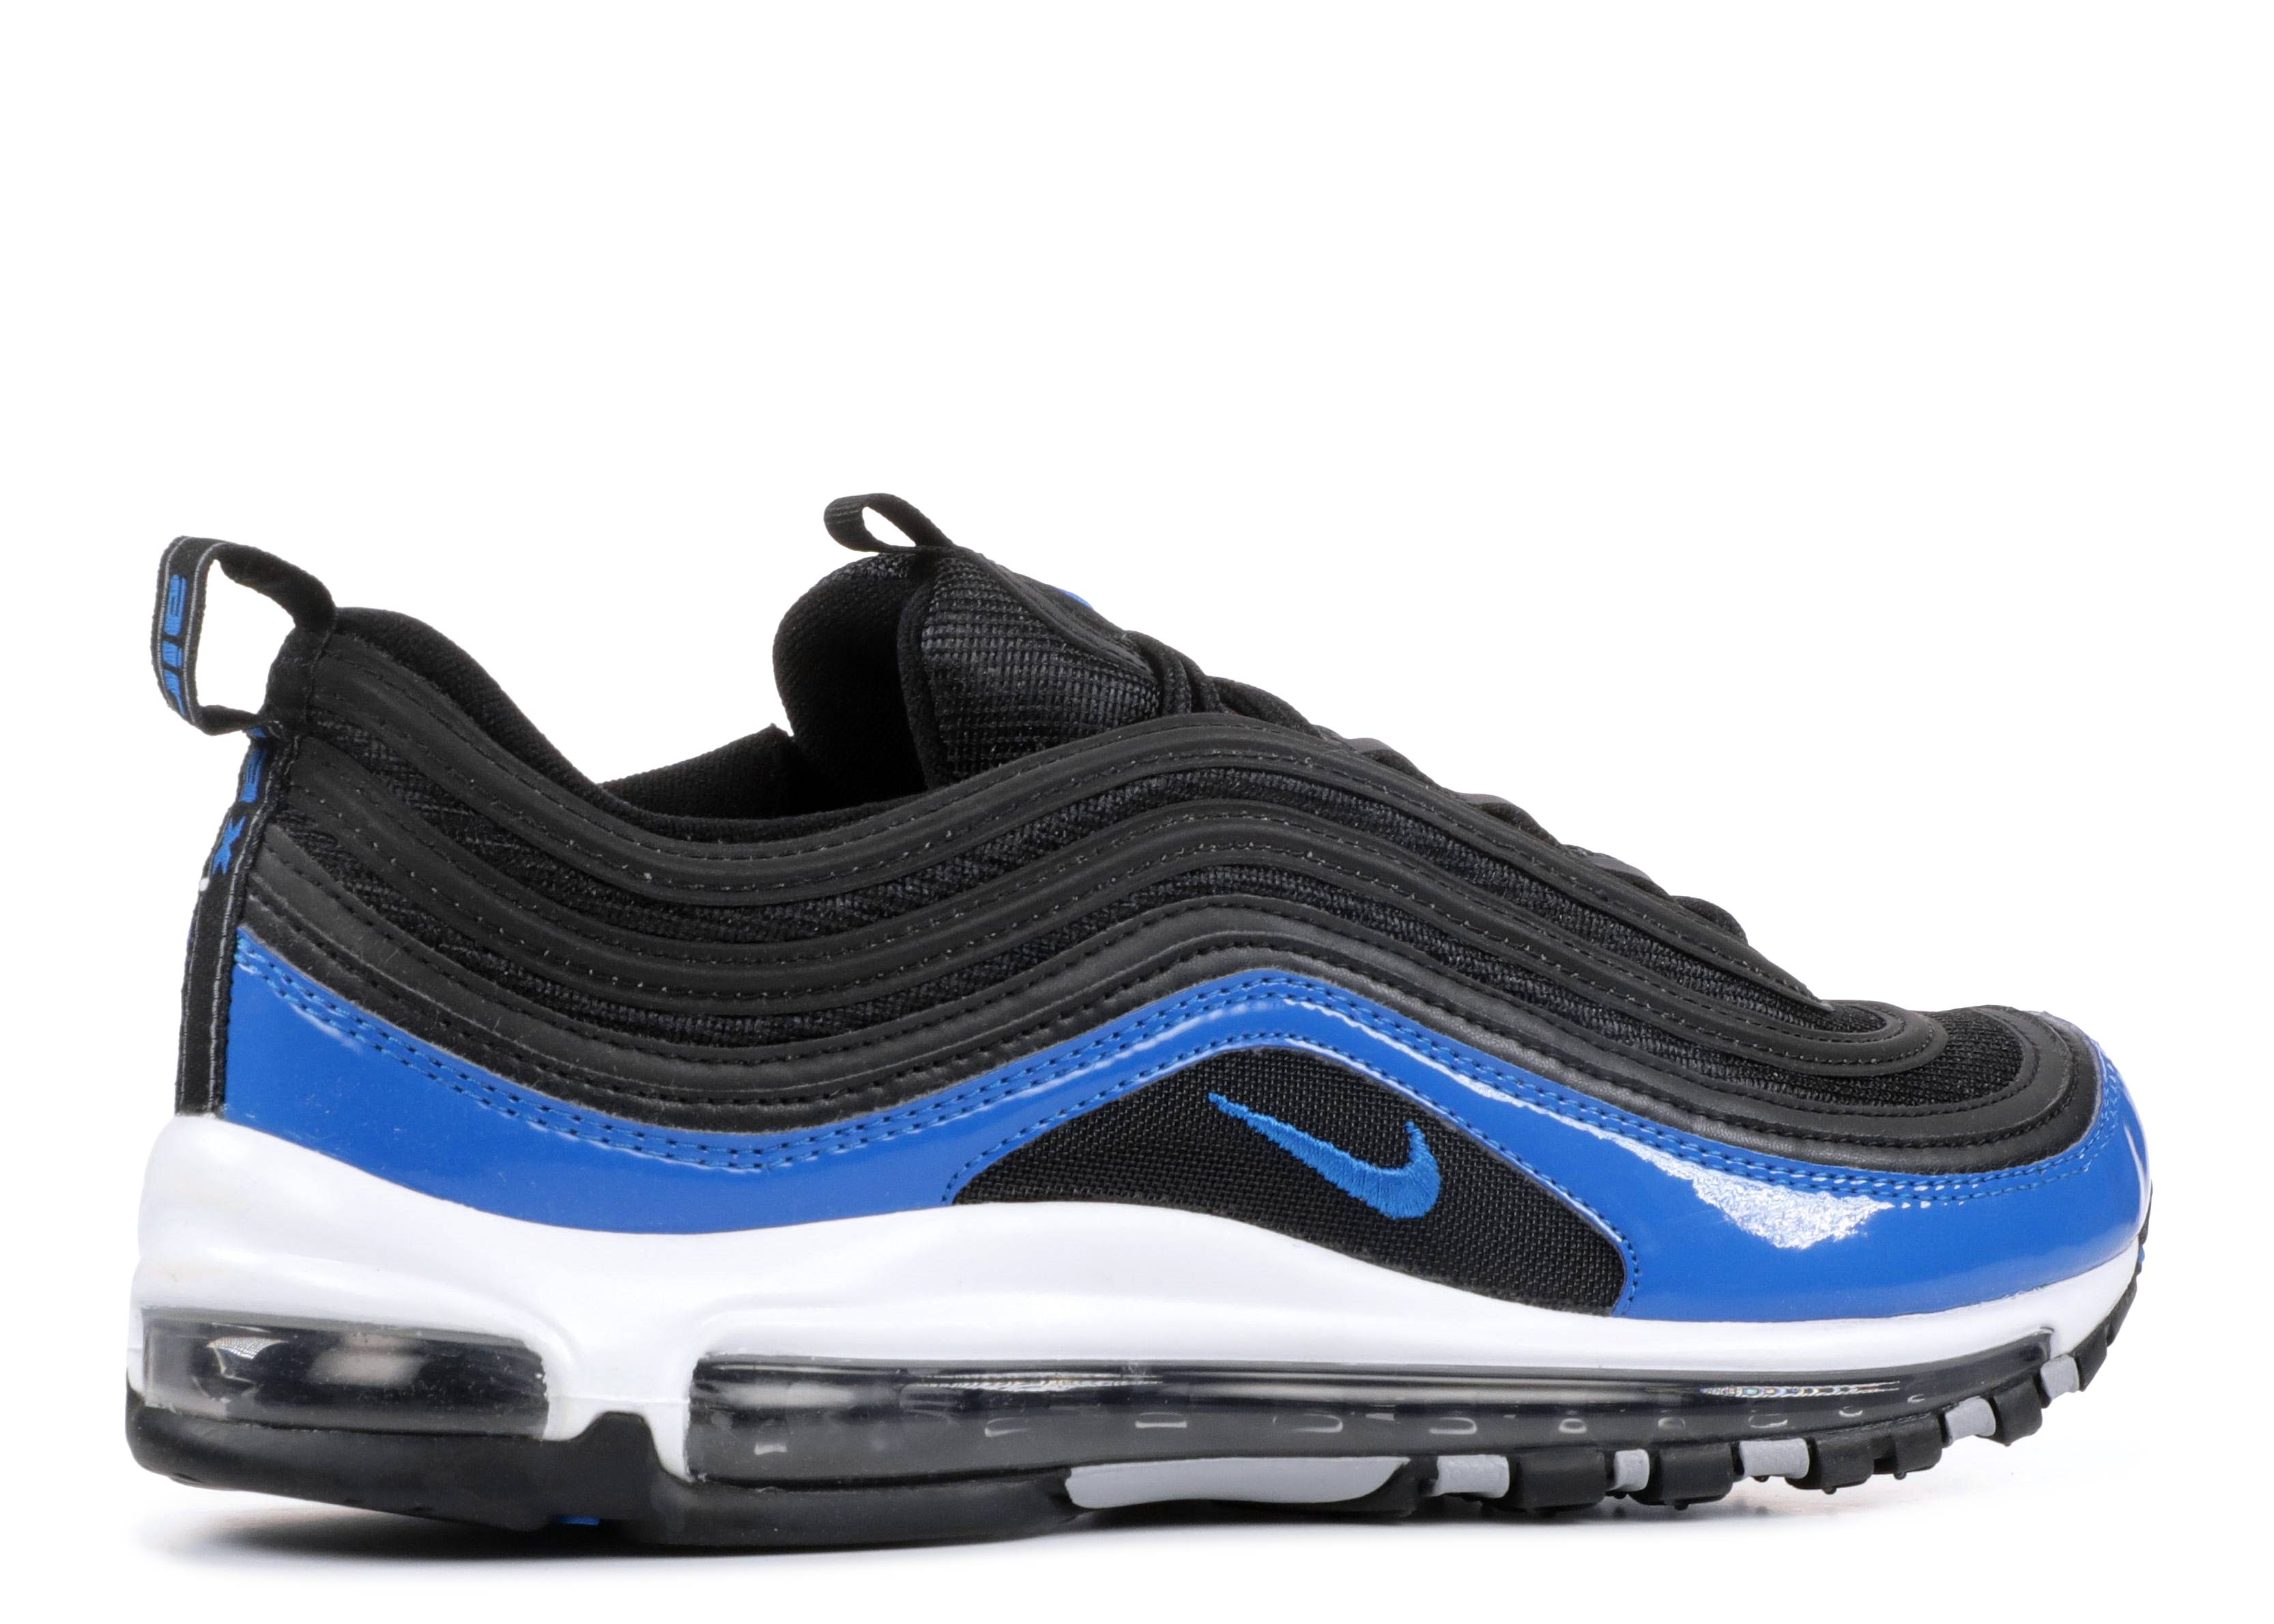 65ba56b8c1dc2e Nike Air Max 97 - Nike - 921826 011 - black blue nebula-wolf-grey-white